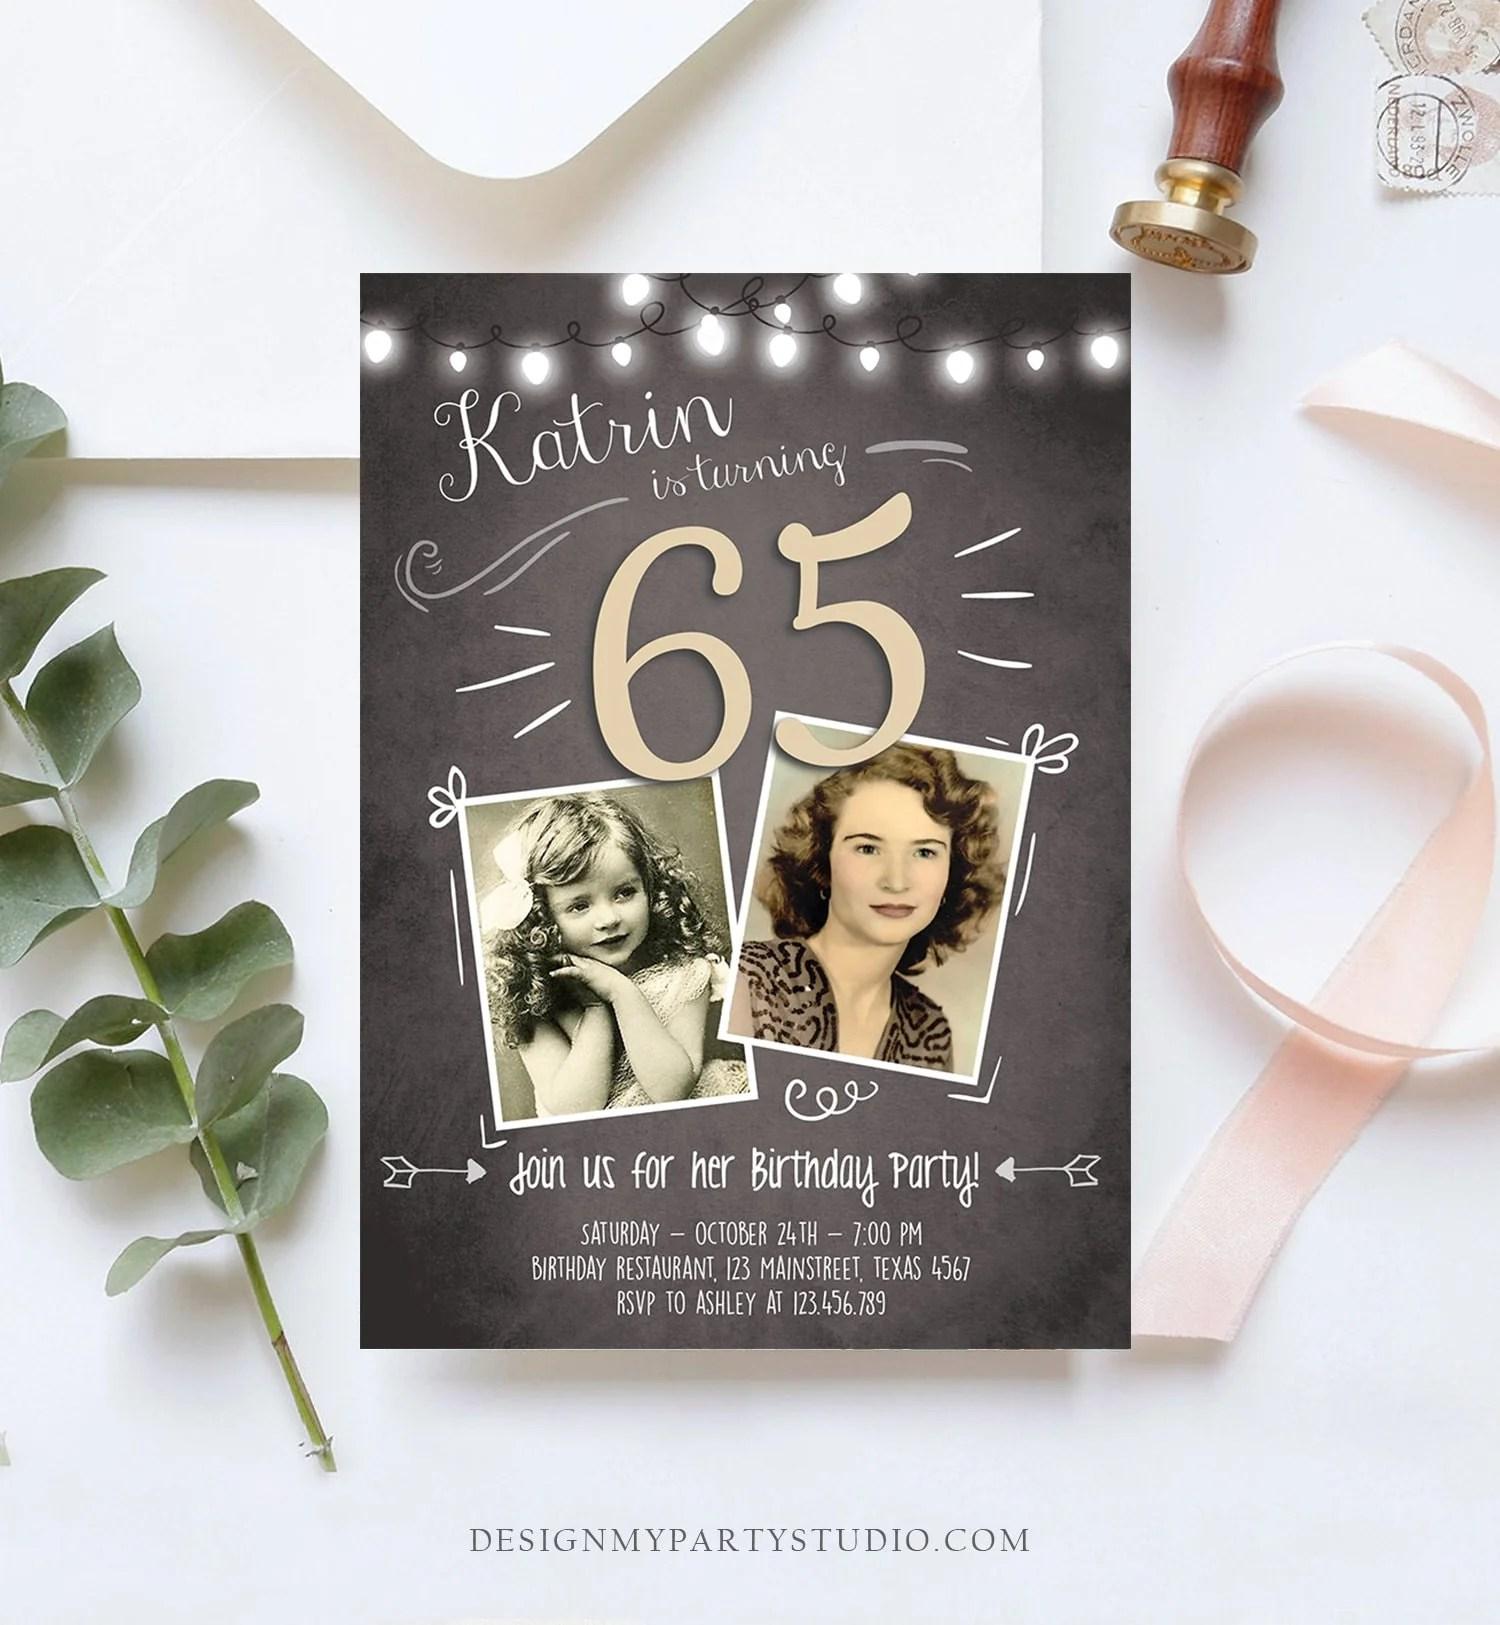 editable 65th birthday invitation any age chalkboard rustic adult sixty fifth photo vintage sapphire jubilee anniversary corjl template 0230